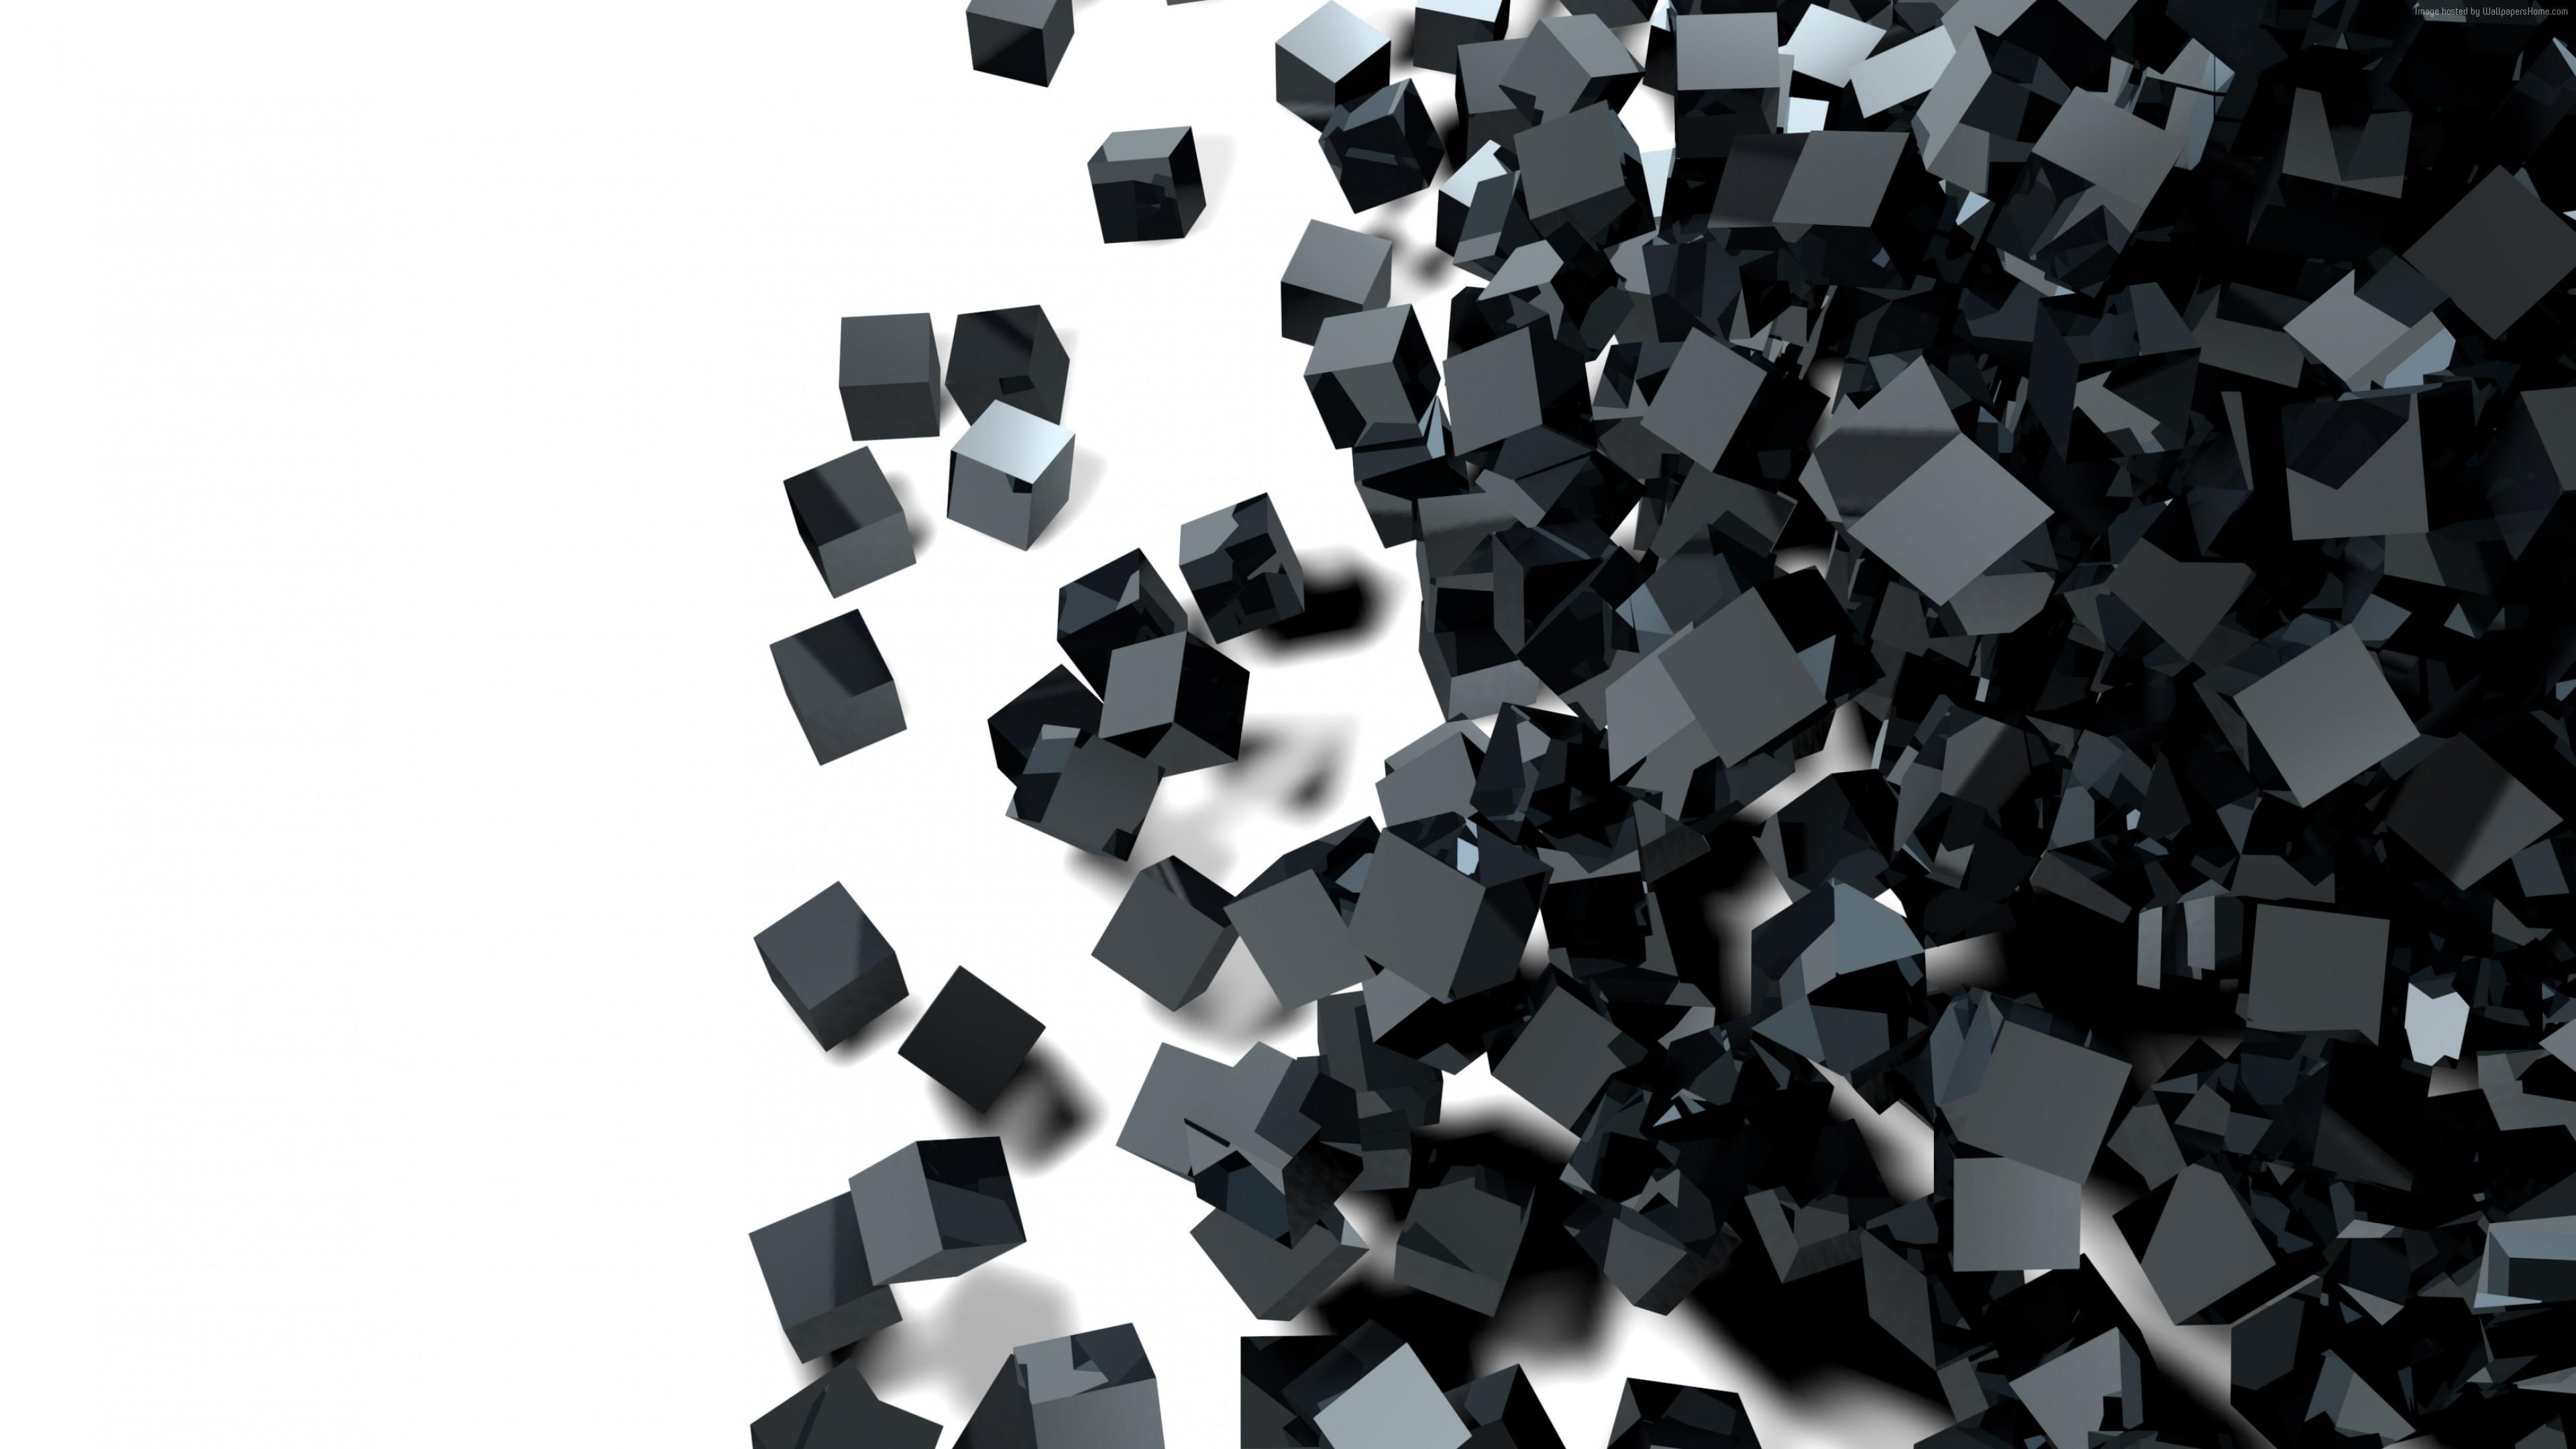 Wallpaper Cube Glass Black 3d 4k Abstract Wallpaper Download High Resolution 4k Wallpaper,Best Indoor Plants For Oxygen Nasa